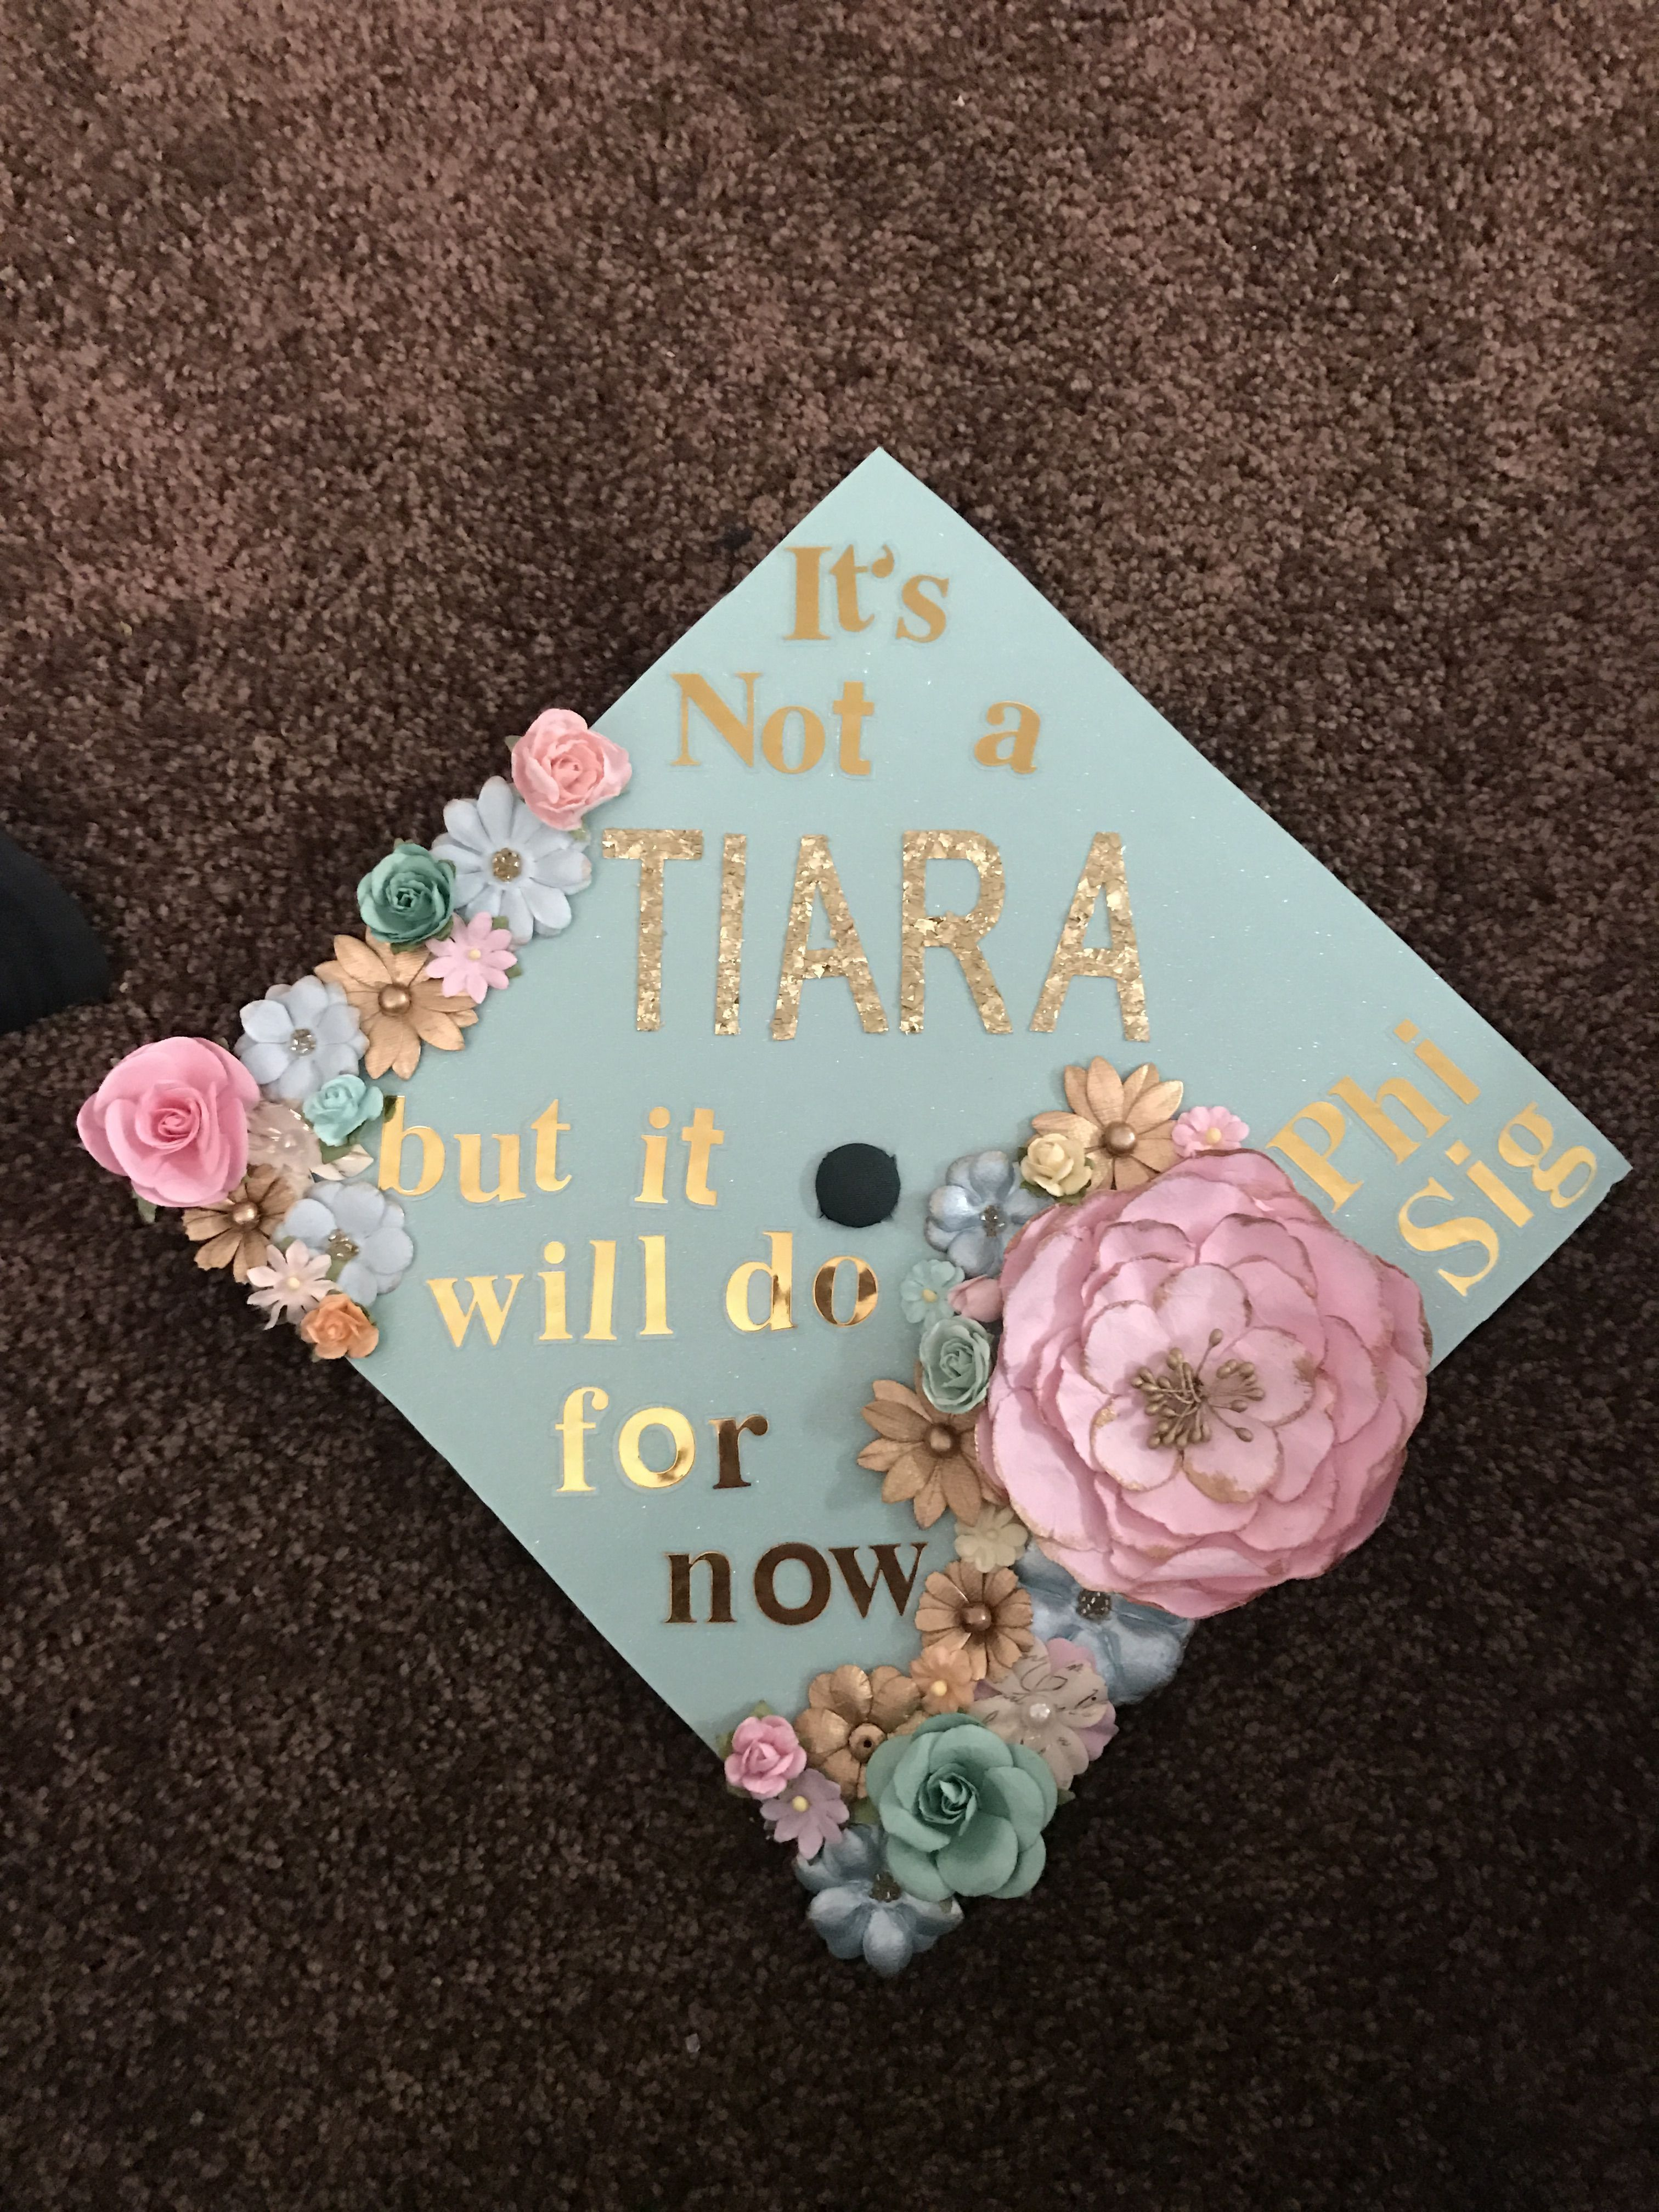 12 Graduation Cap Decoration Flowers Party Ideas  Decoración de